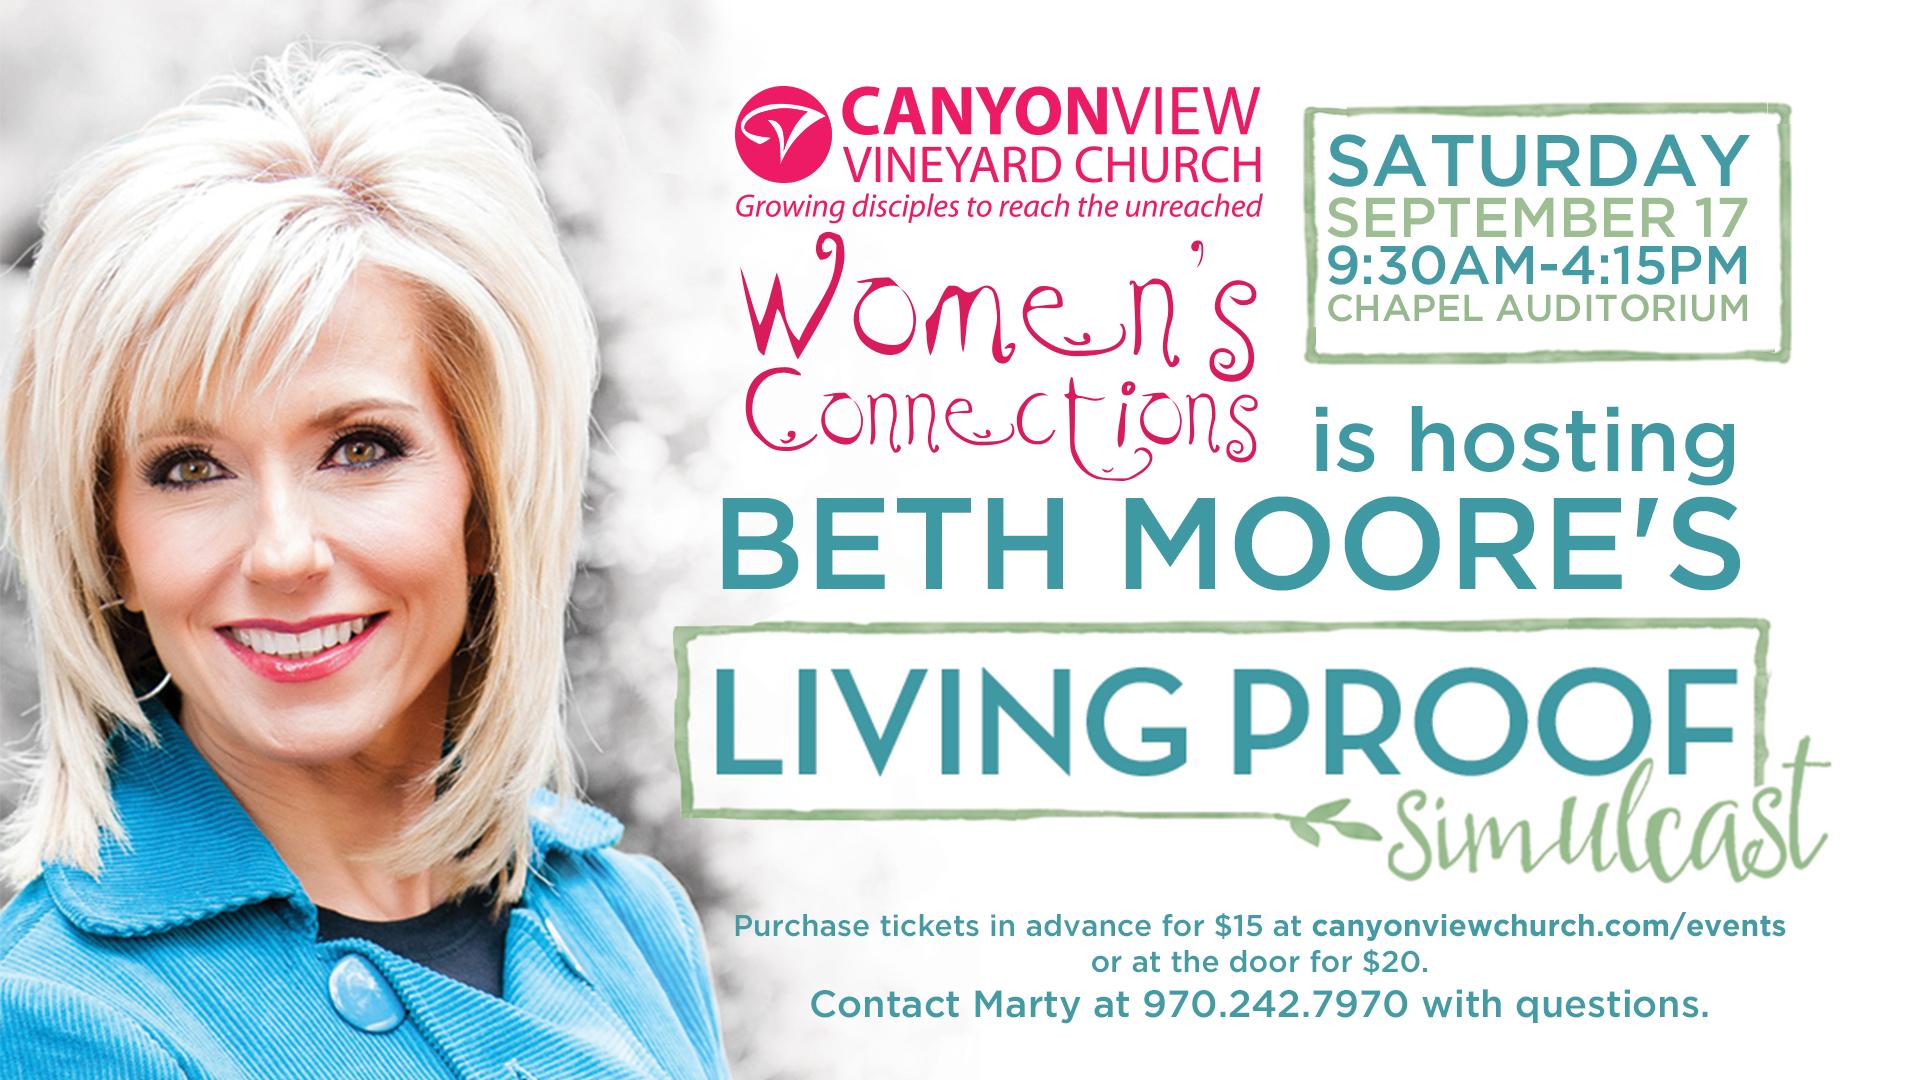 Beth Moore Living Proof Simulcast